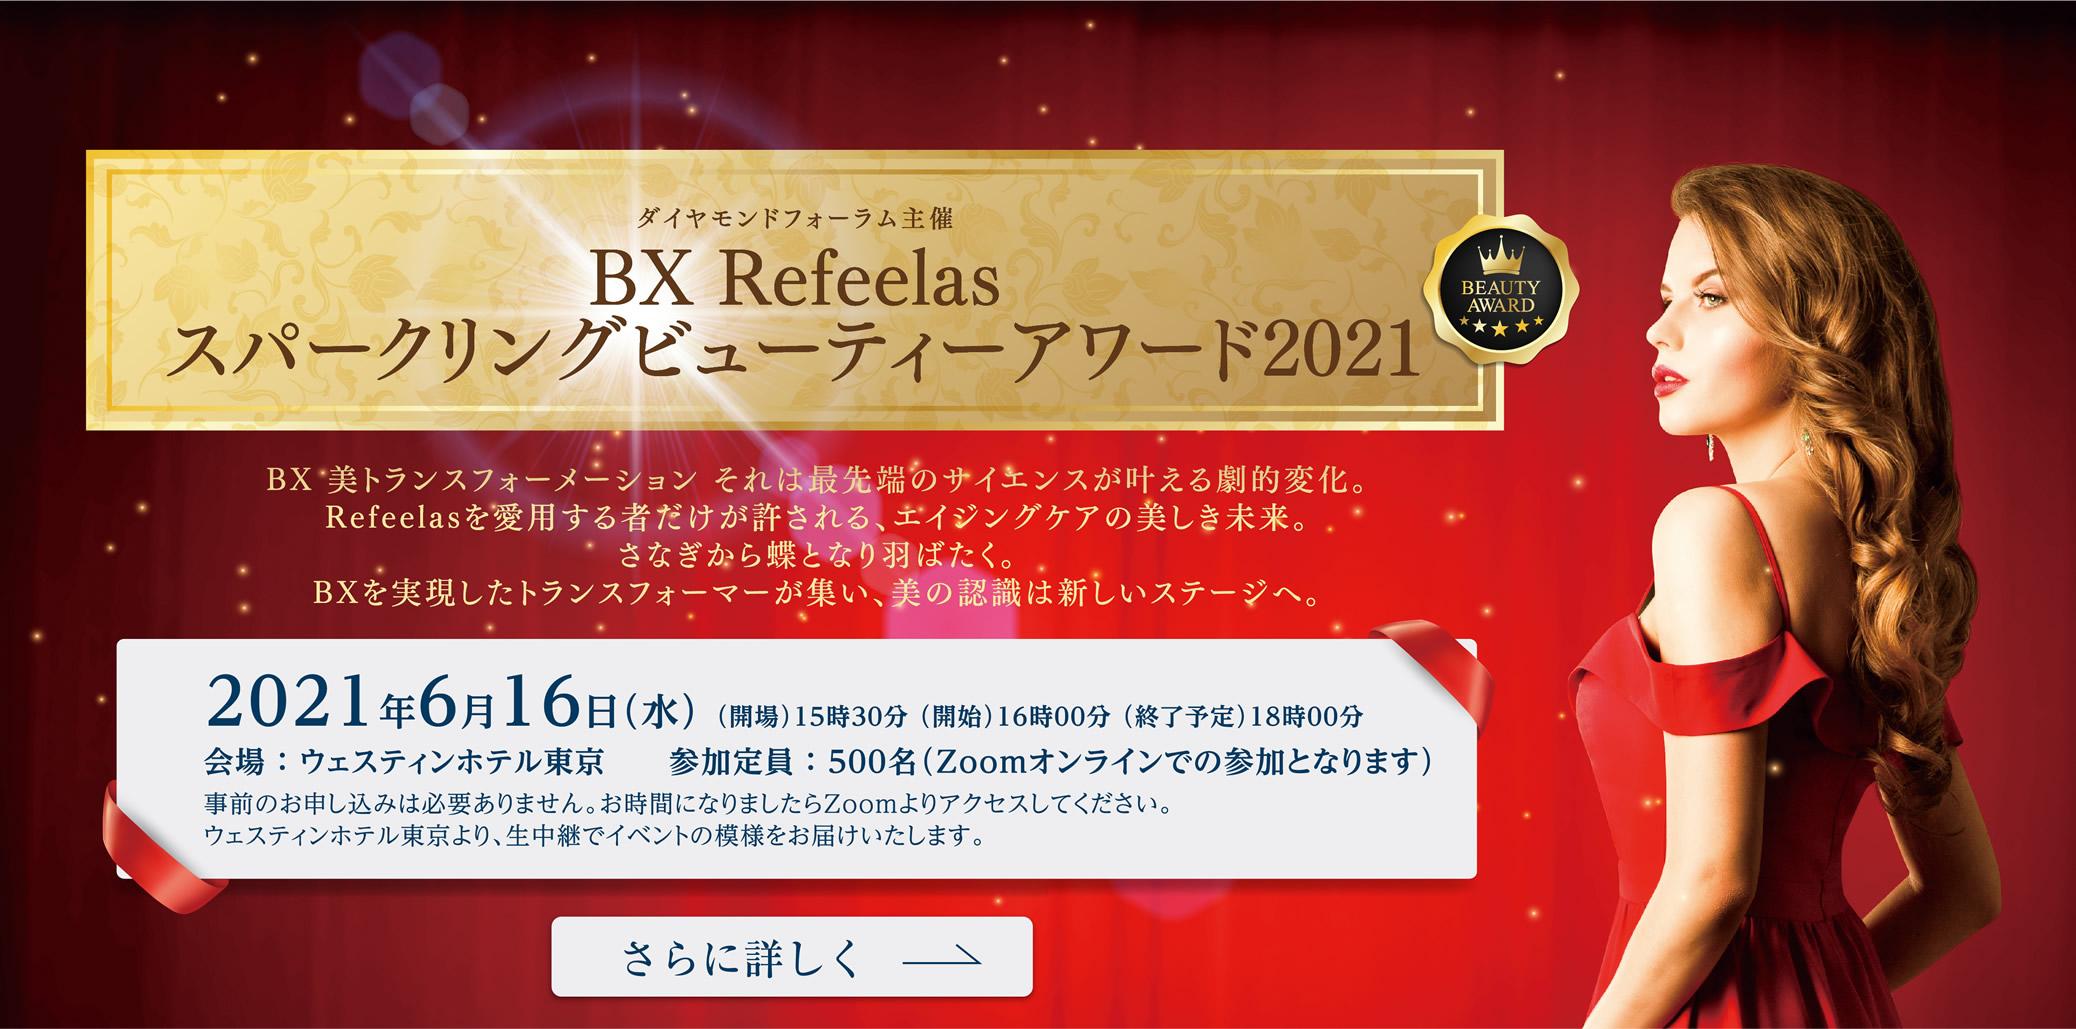 BX Refeelas スパークリングビューティーアワード2021開催決定!